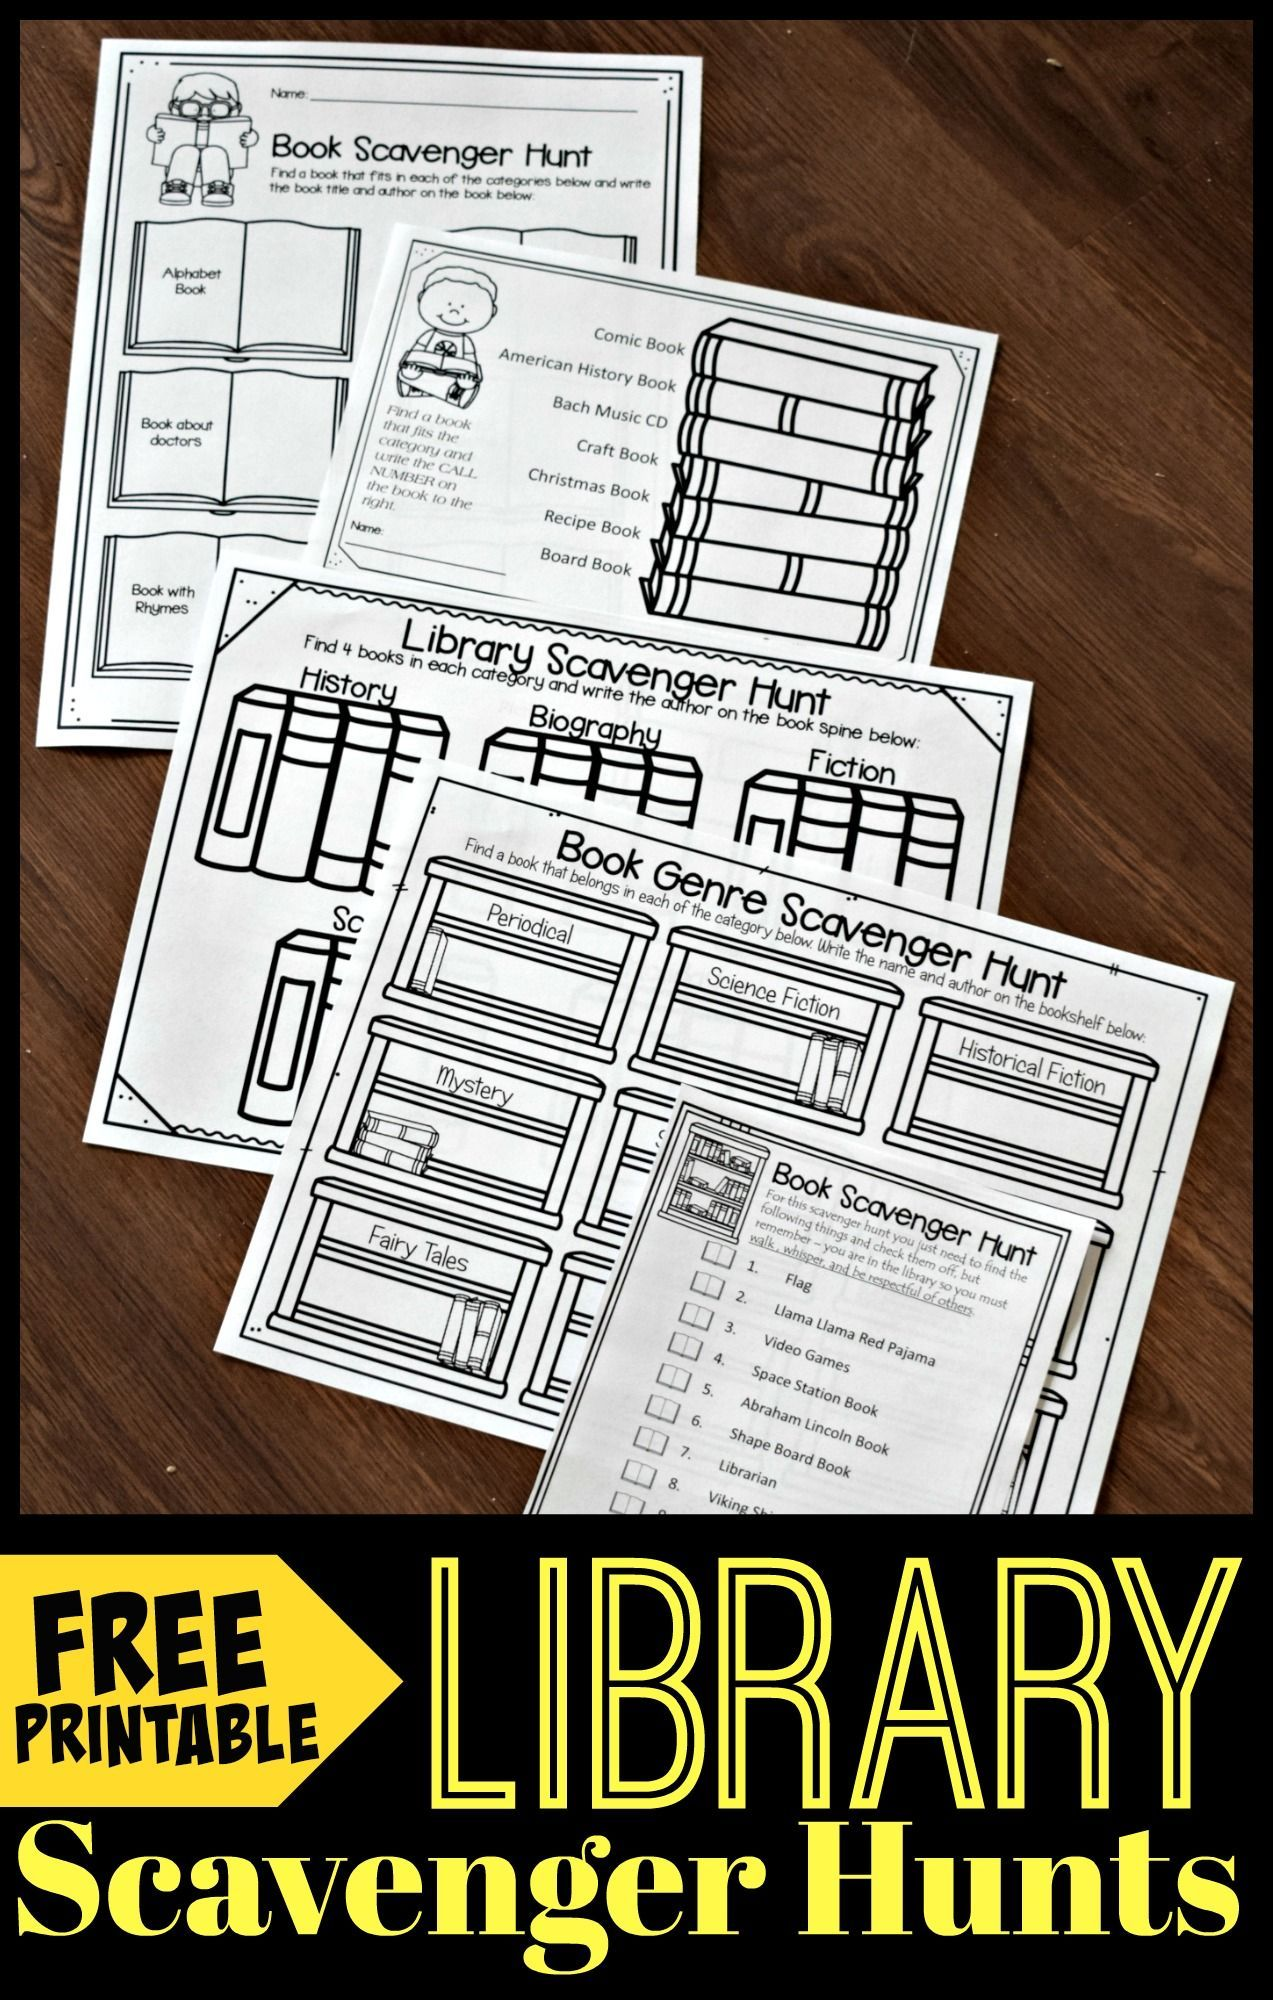 FREE Library Scavenger Hunt   Library scavenger hunts [ 2000 x 1273 Pixel ]